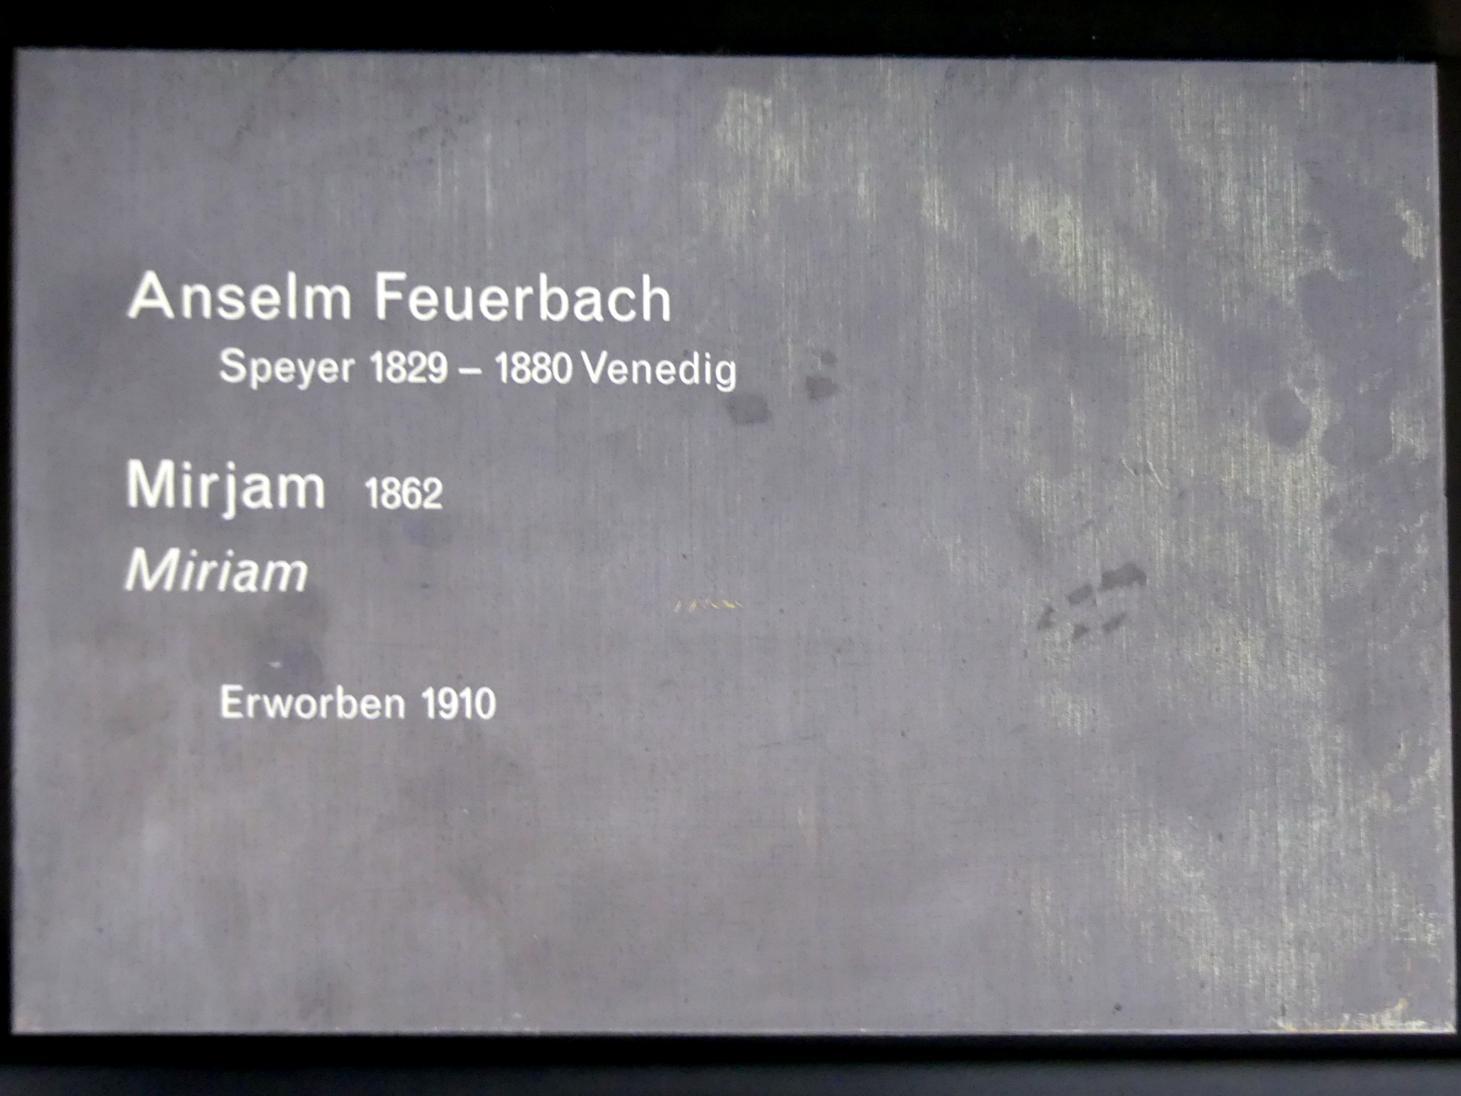 Anselm Feuerbach: Mirjam, 1862, Bild 2/2